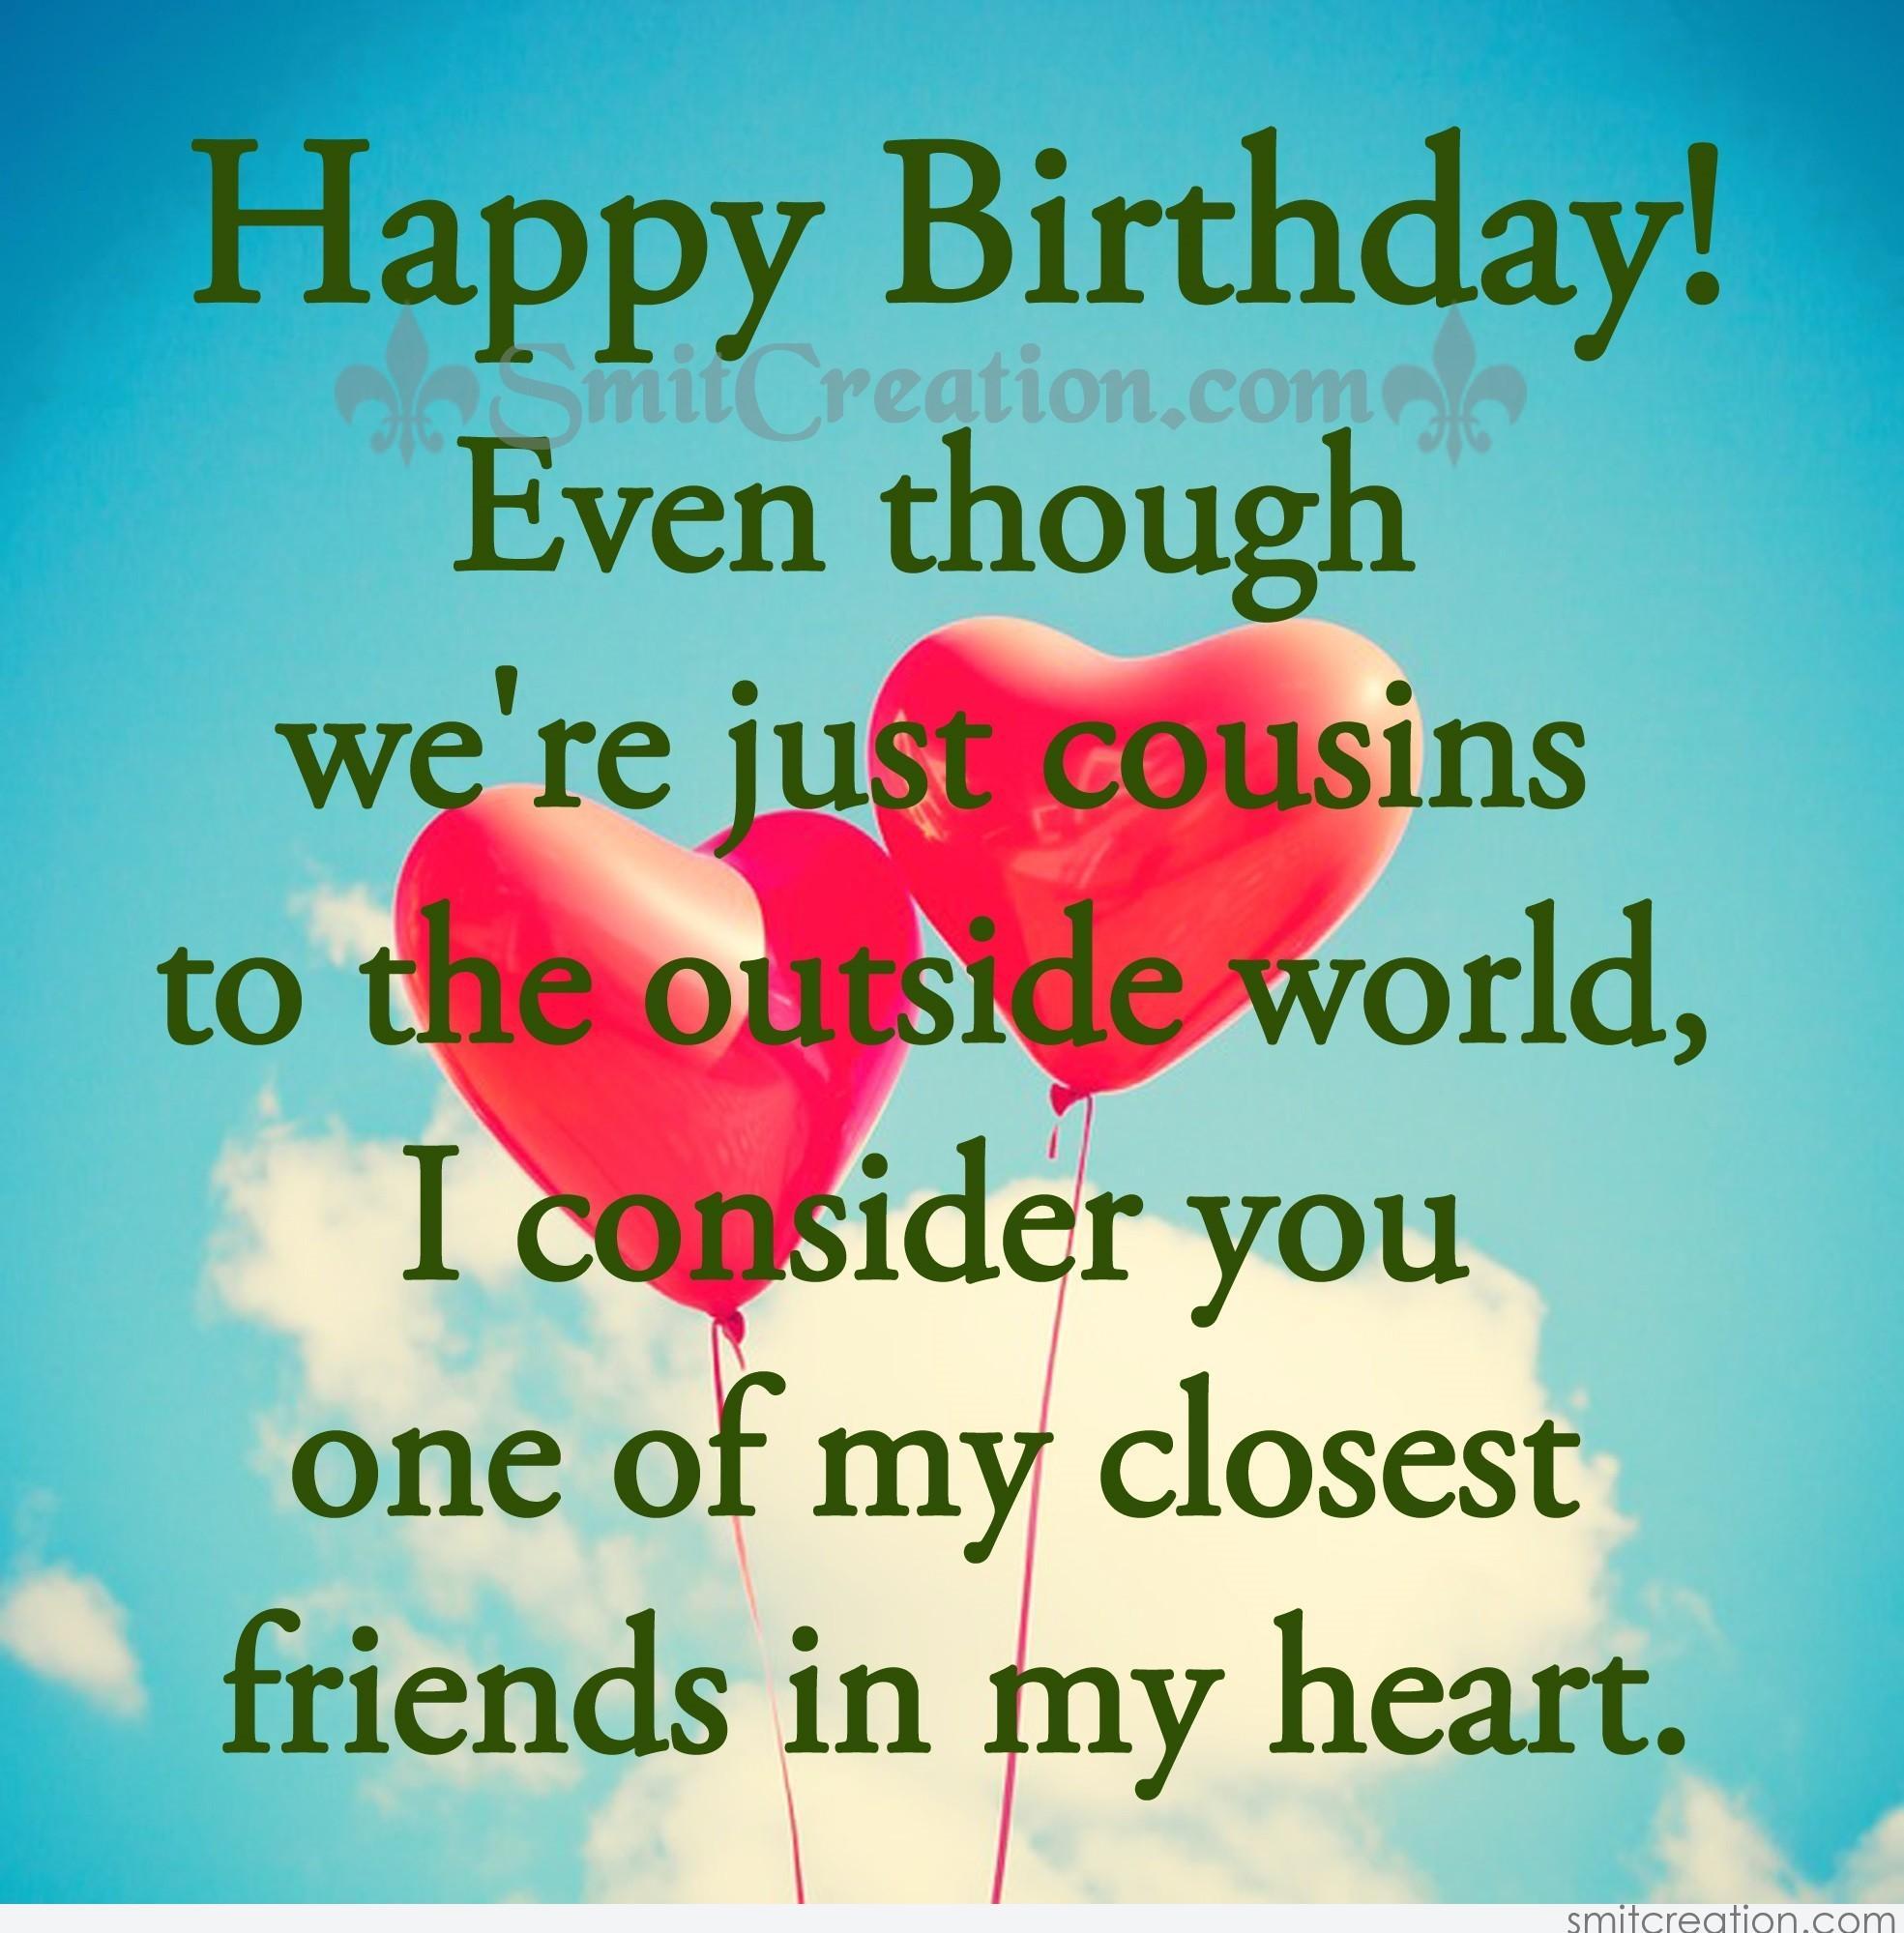 Happy Birthday Cousine Smitcreation Com Happy Birthday Wishes To My Cousin